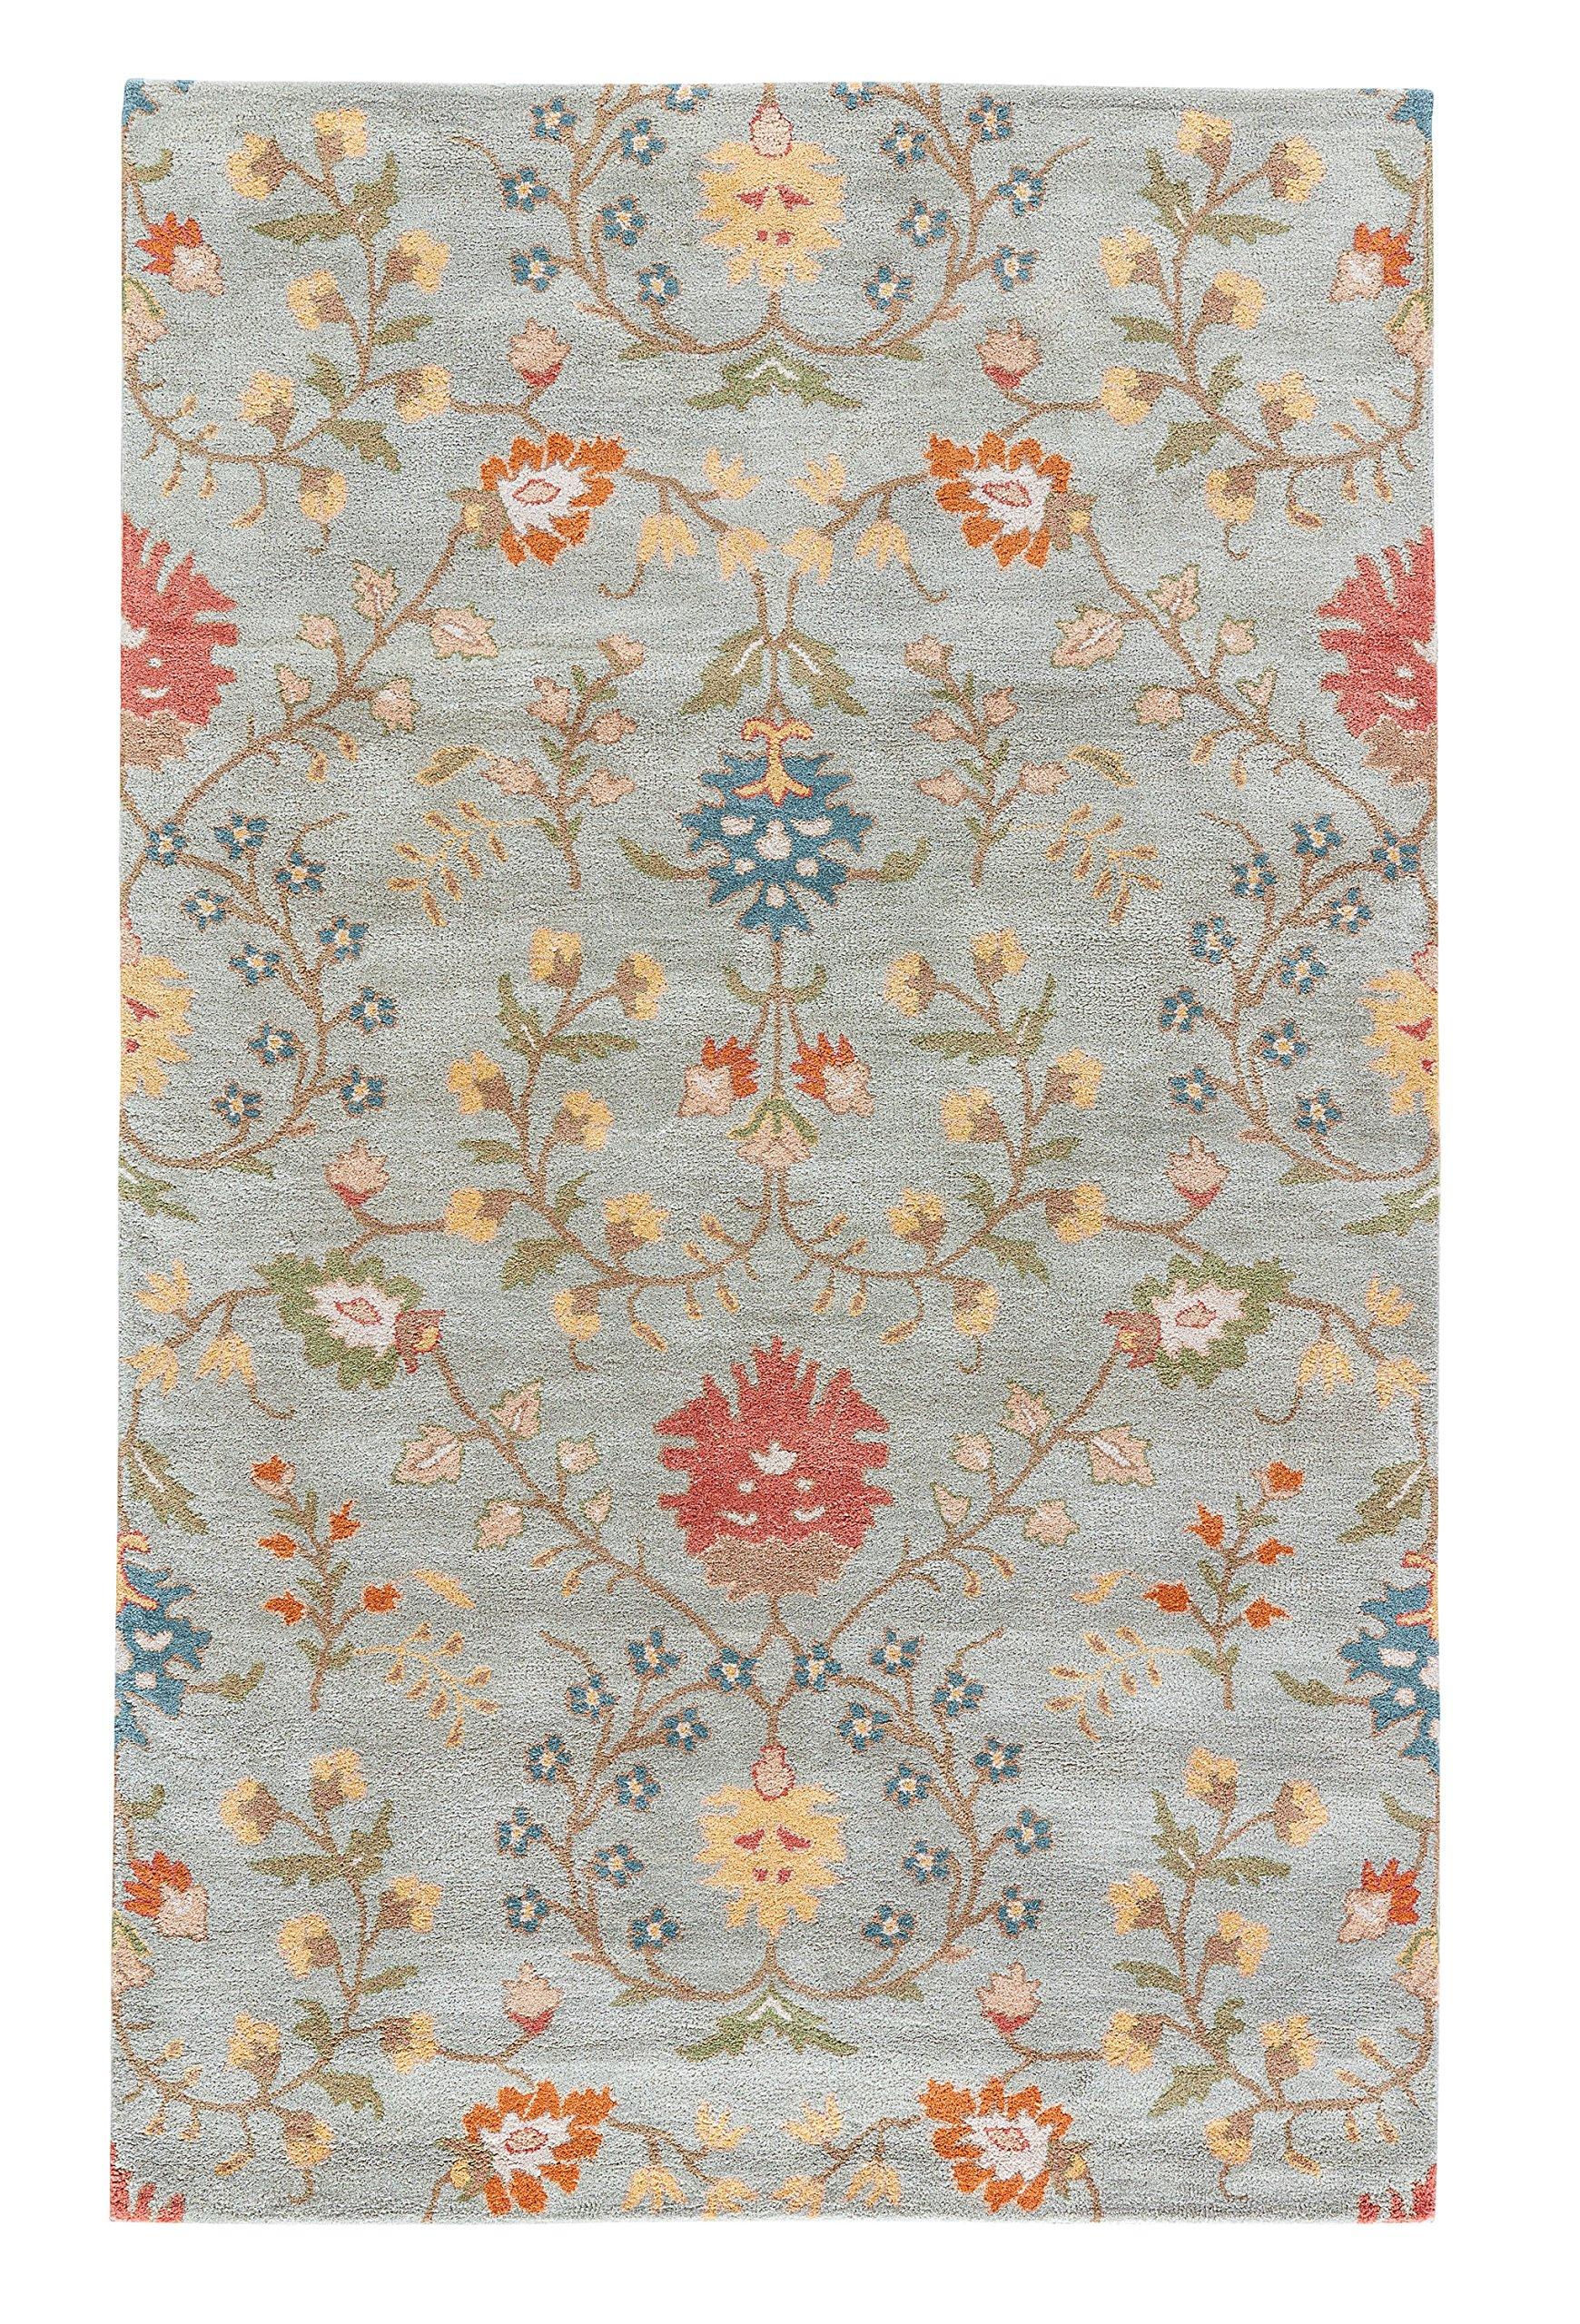 Jaipur Living Amara Hand-Tufted Floral & Leaves Blue Area Rug (8' X 11')